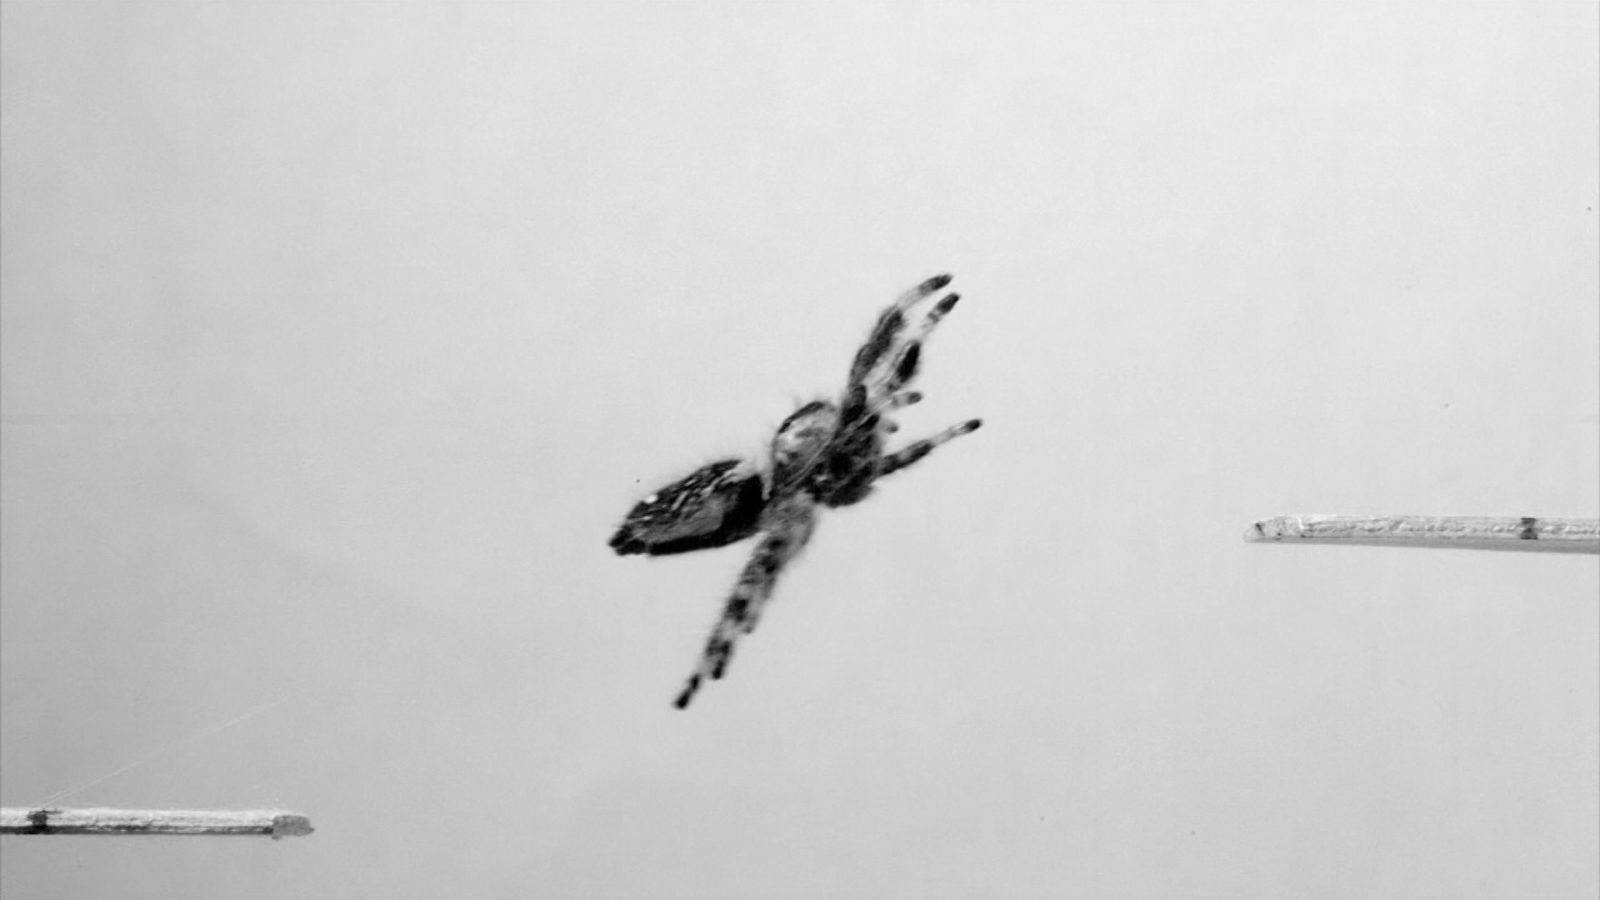 Nw_dly_ds1802001_254_spider_jumps_on_cue_op_p180508_es~~~~~es~mux~~1